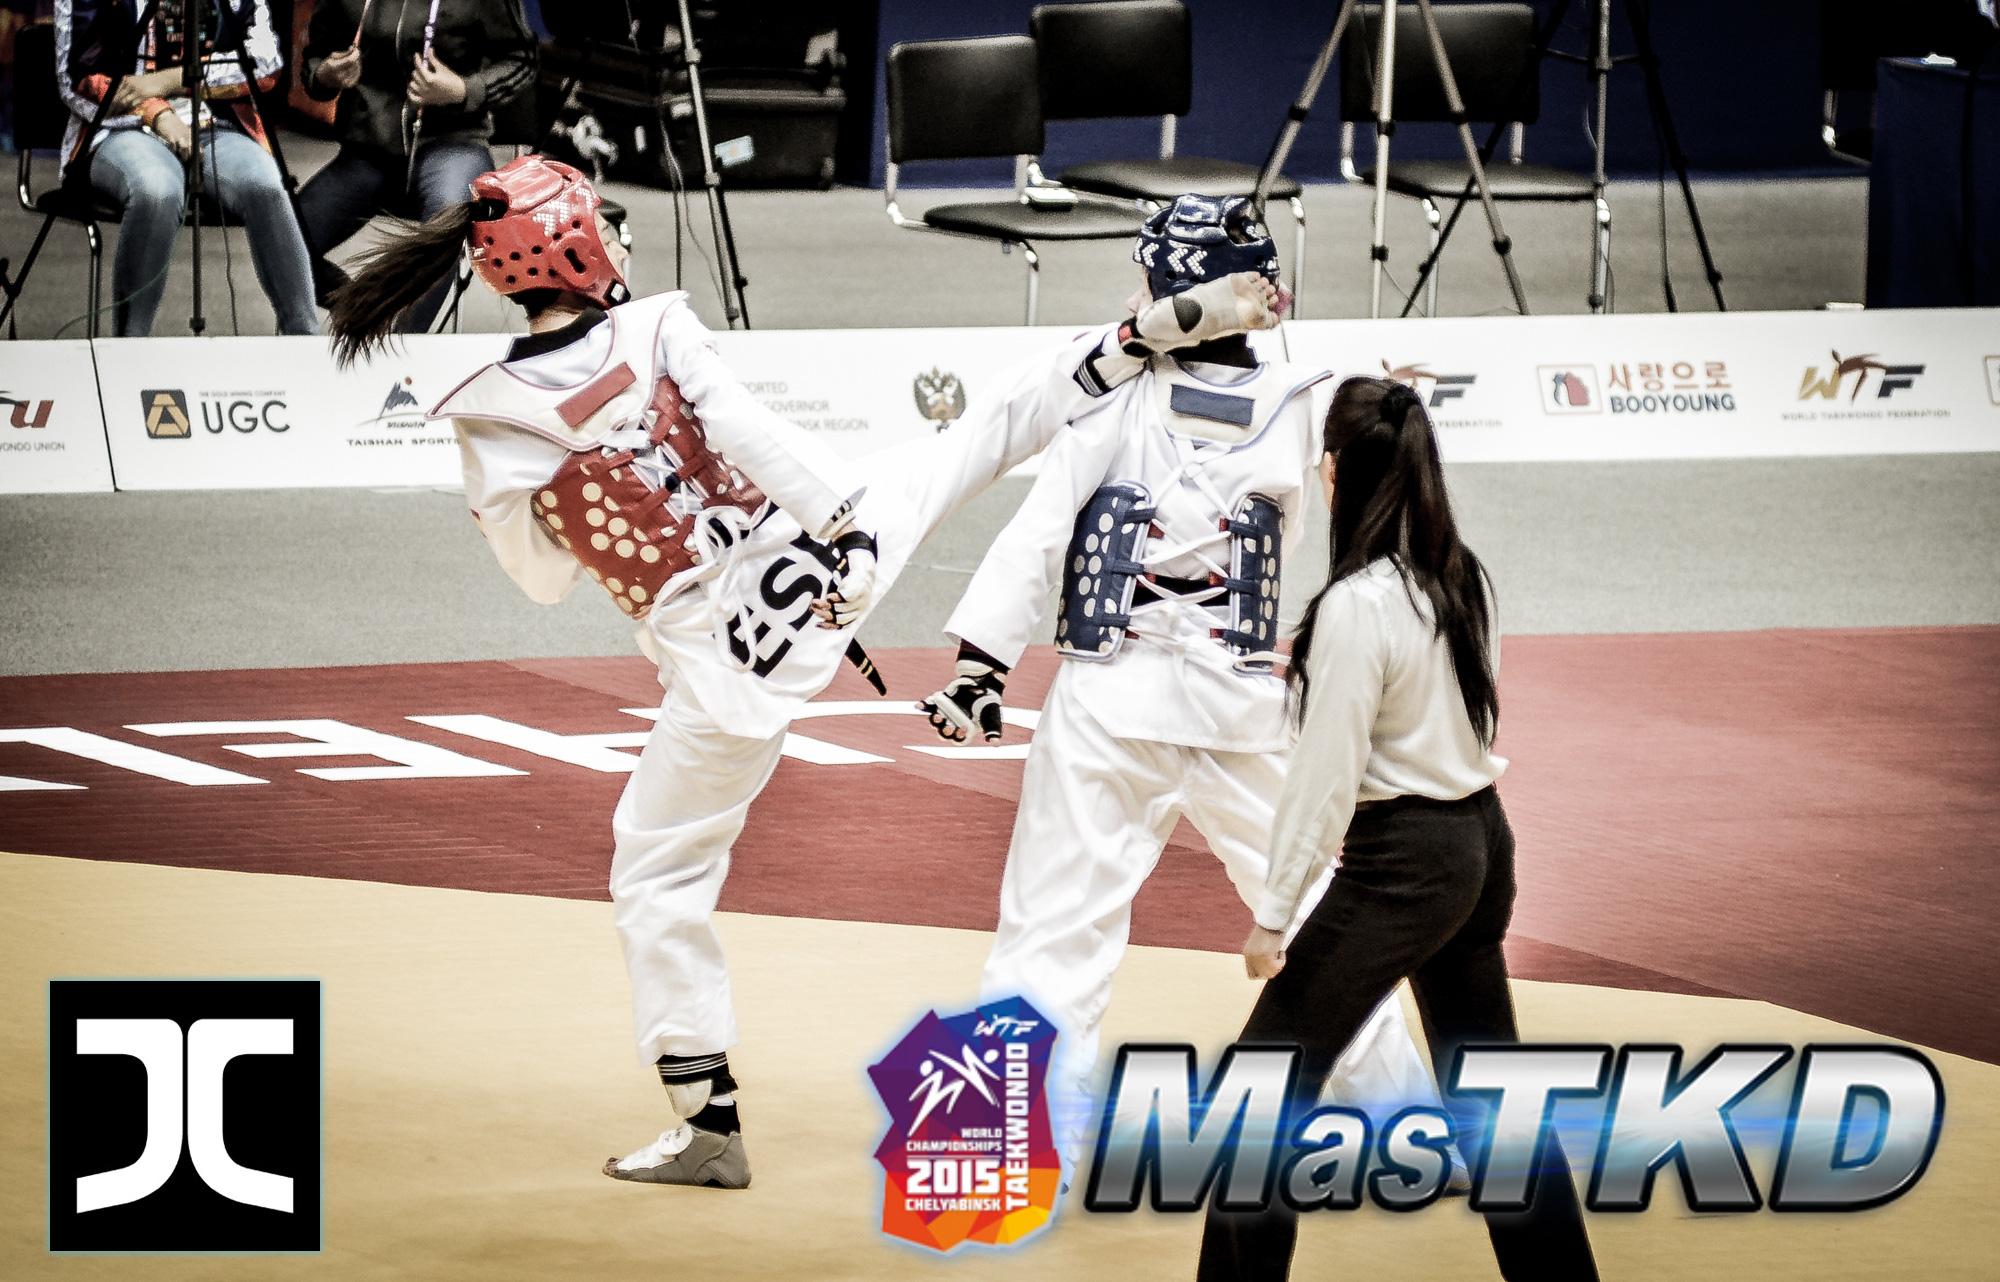 02_Mundial-Taekwondo_JCalicu-Seleccion-Mejor-Foto